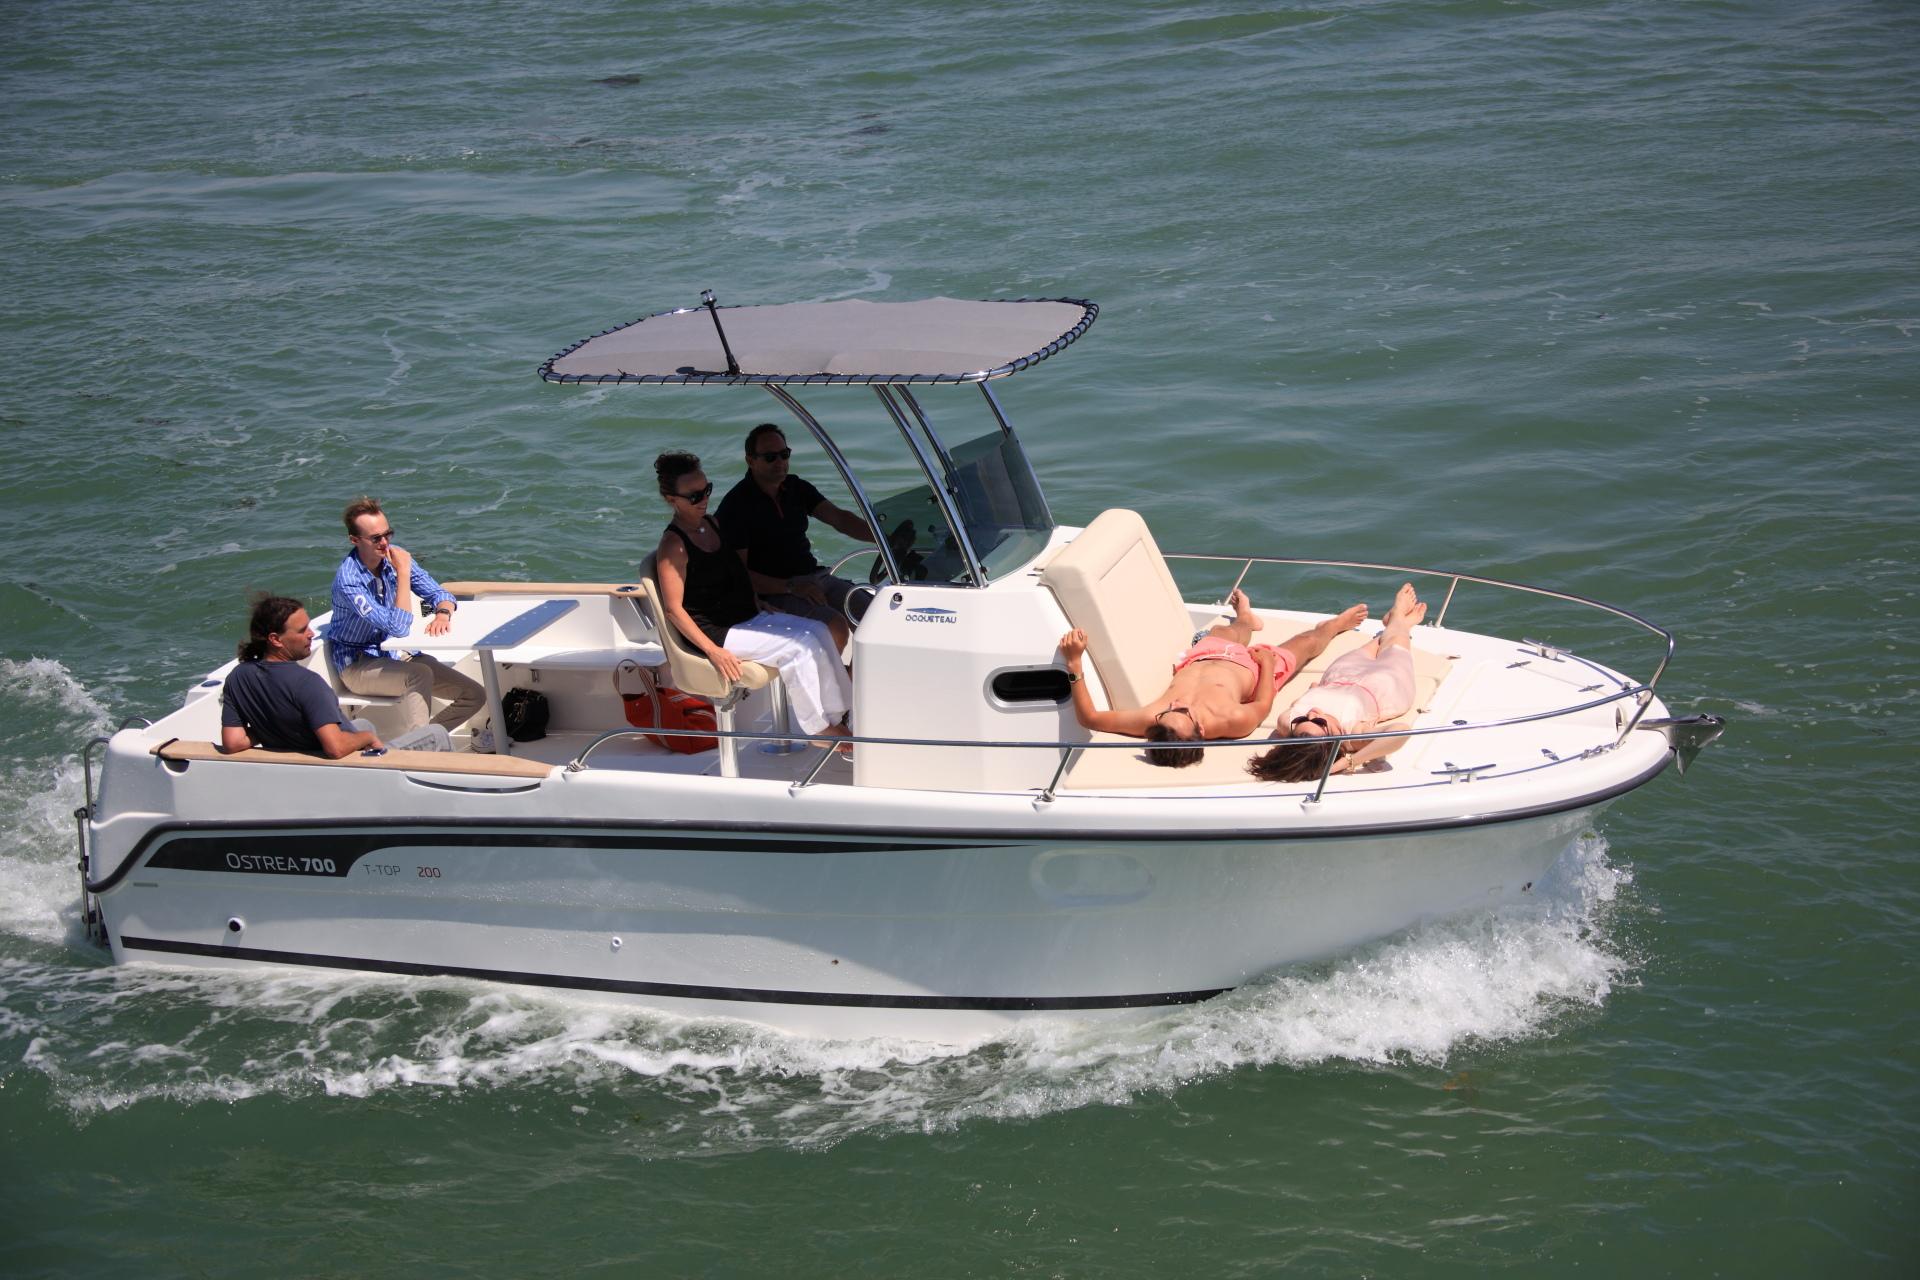 bateau moteur ocqueteau ostrea 700 open t top unlimited notre gamme ocqueteau. Black Bedroom Furniture Sets. Home Design Ideas